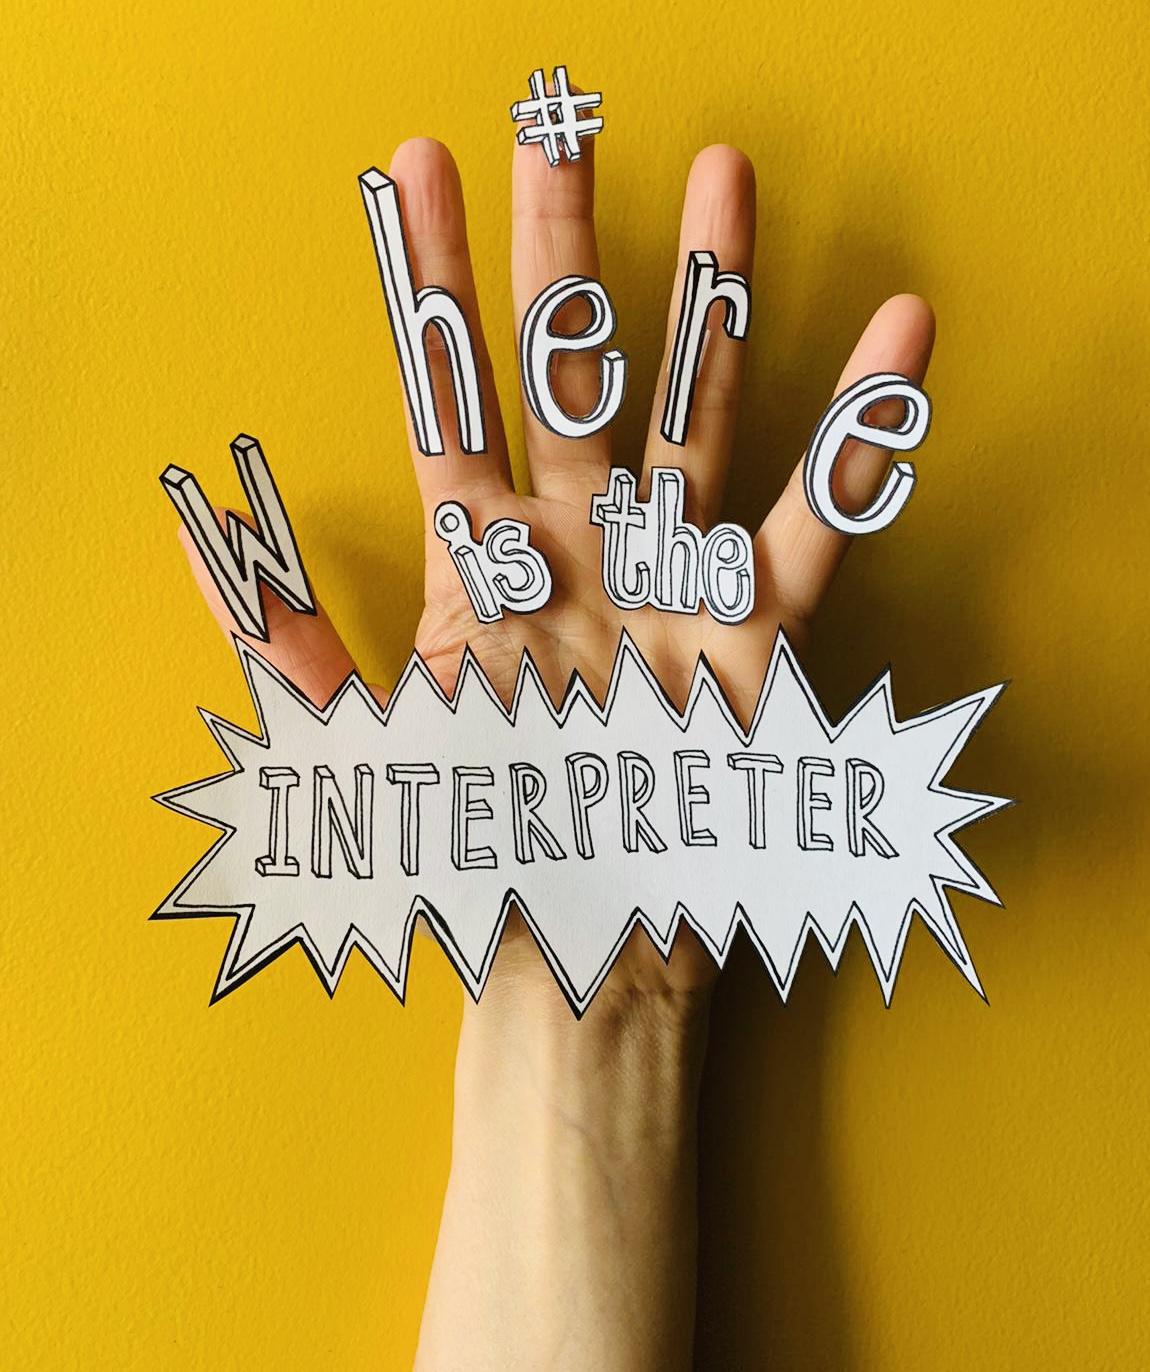 Where Is The Interpreter?